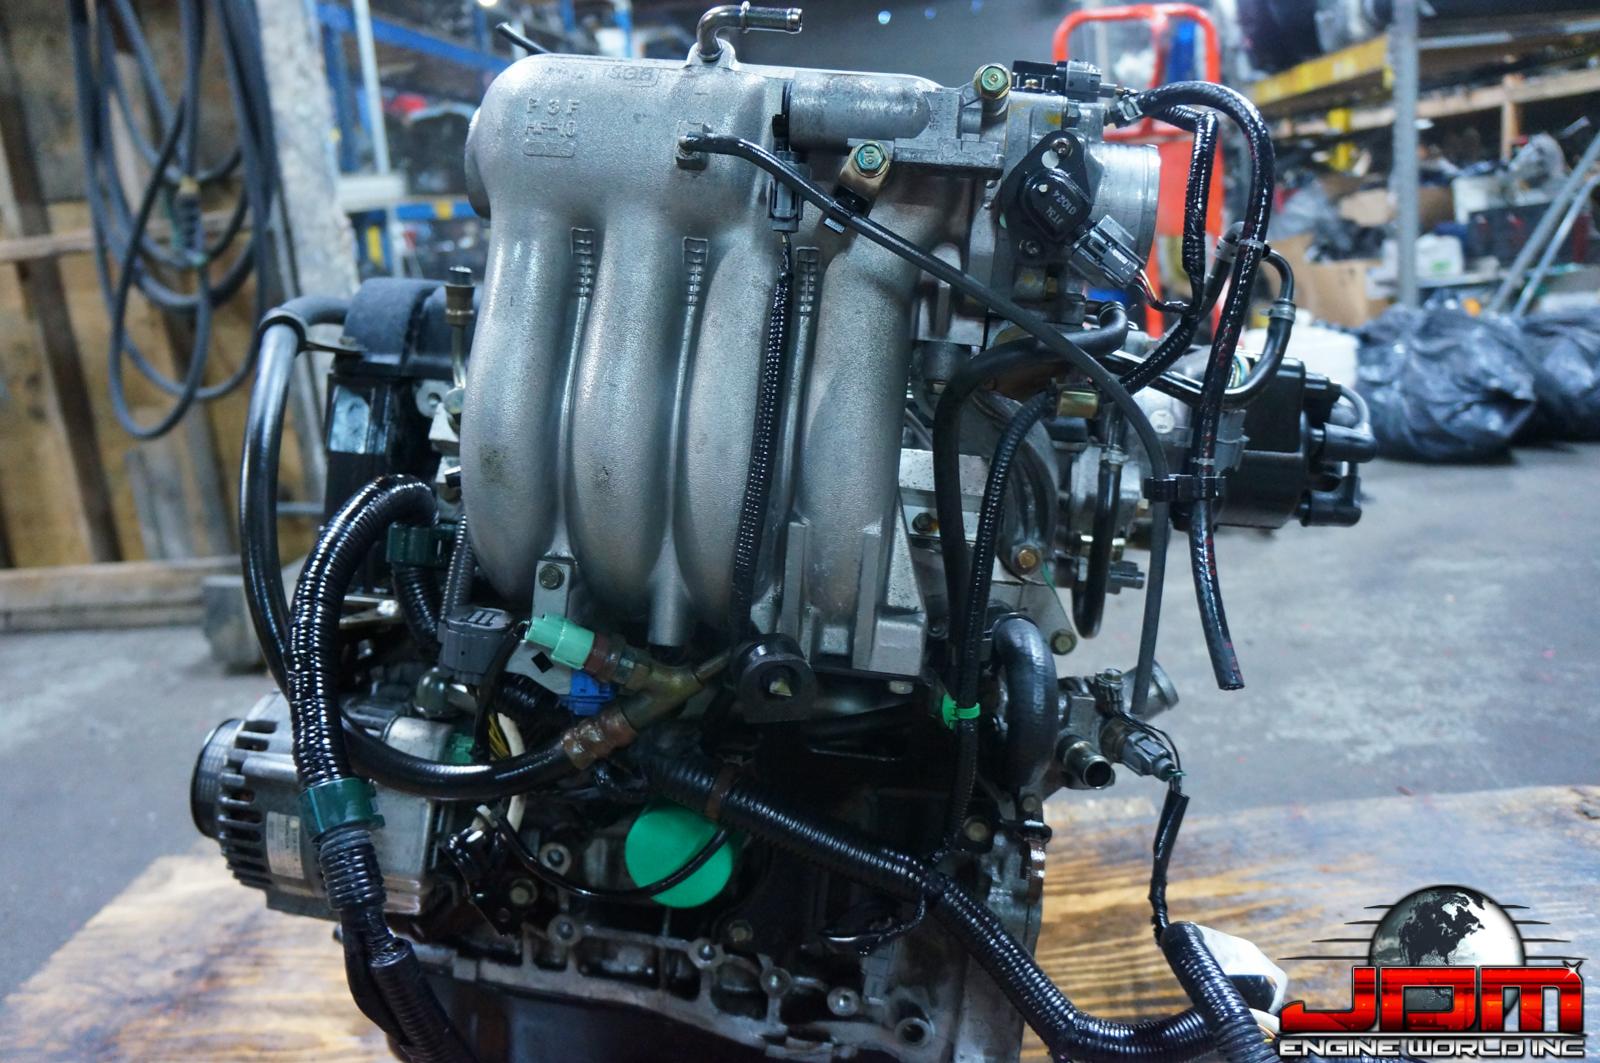 HONDA B20B HIGH COMPRESSION ENGINE 2.0L DOHC JDM B20B